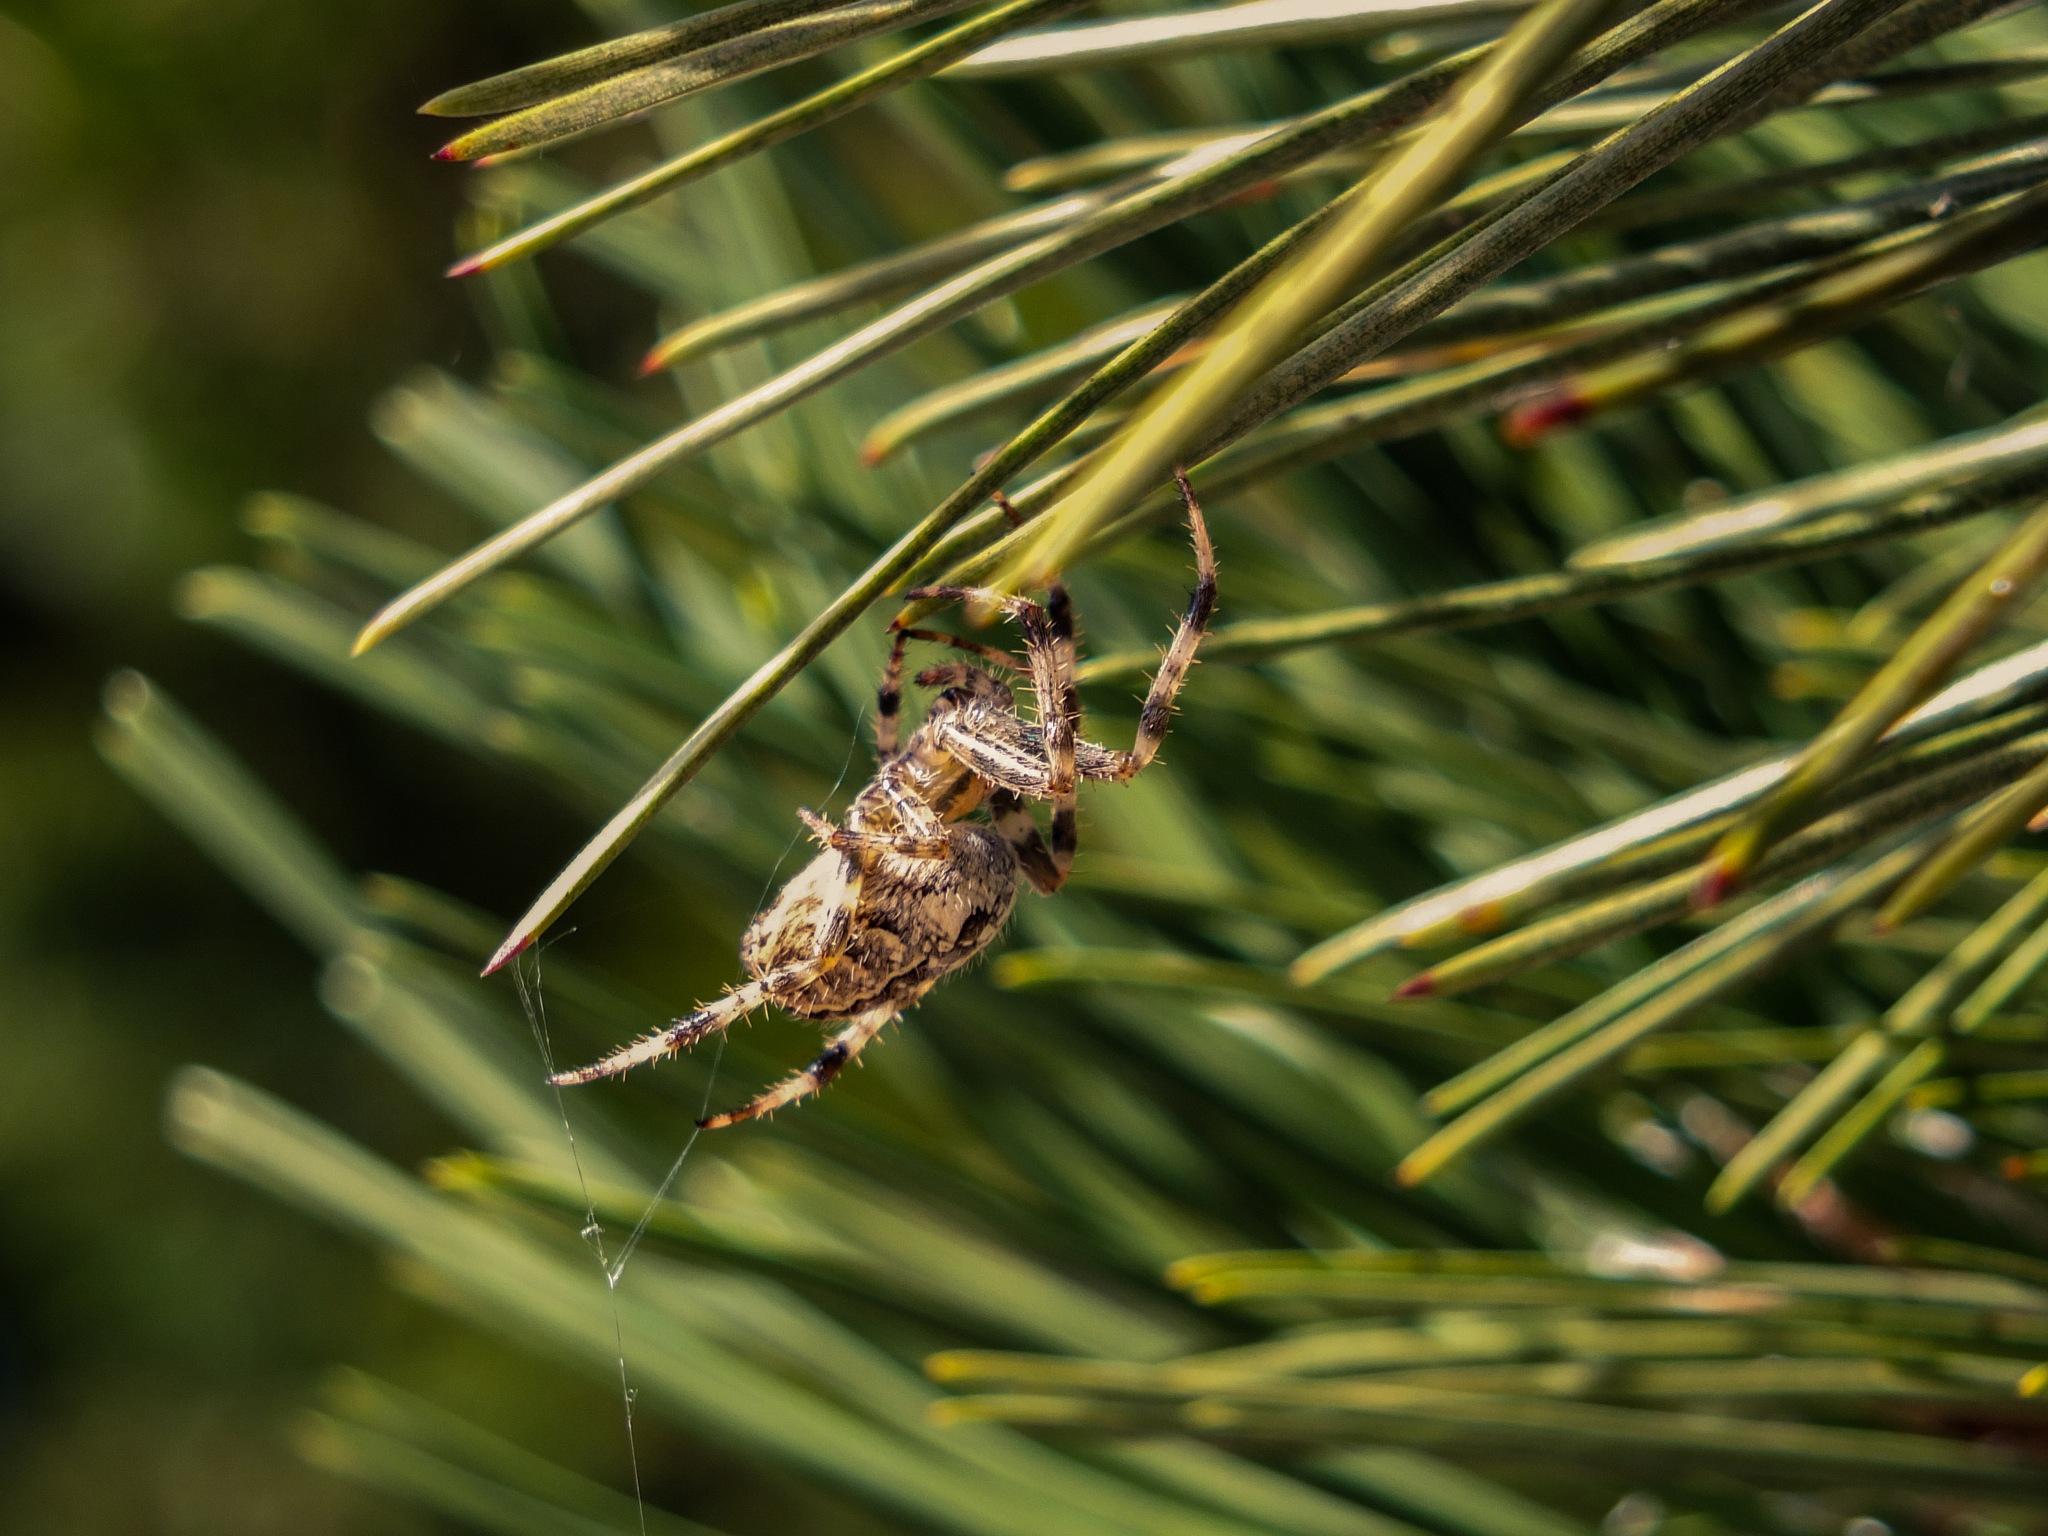 Araneus diadematus by Martin Bednář